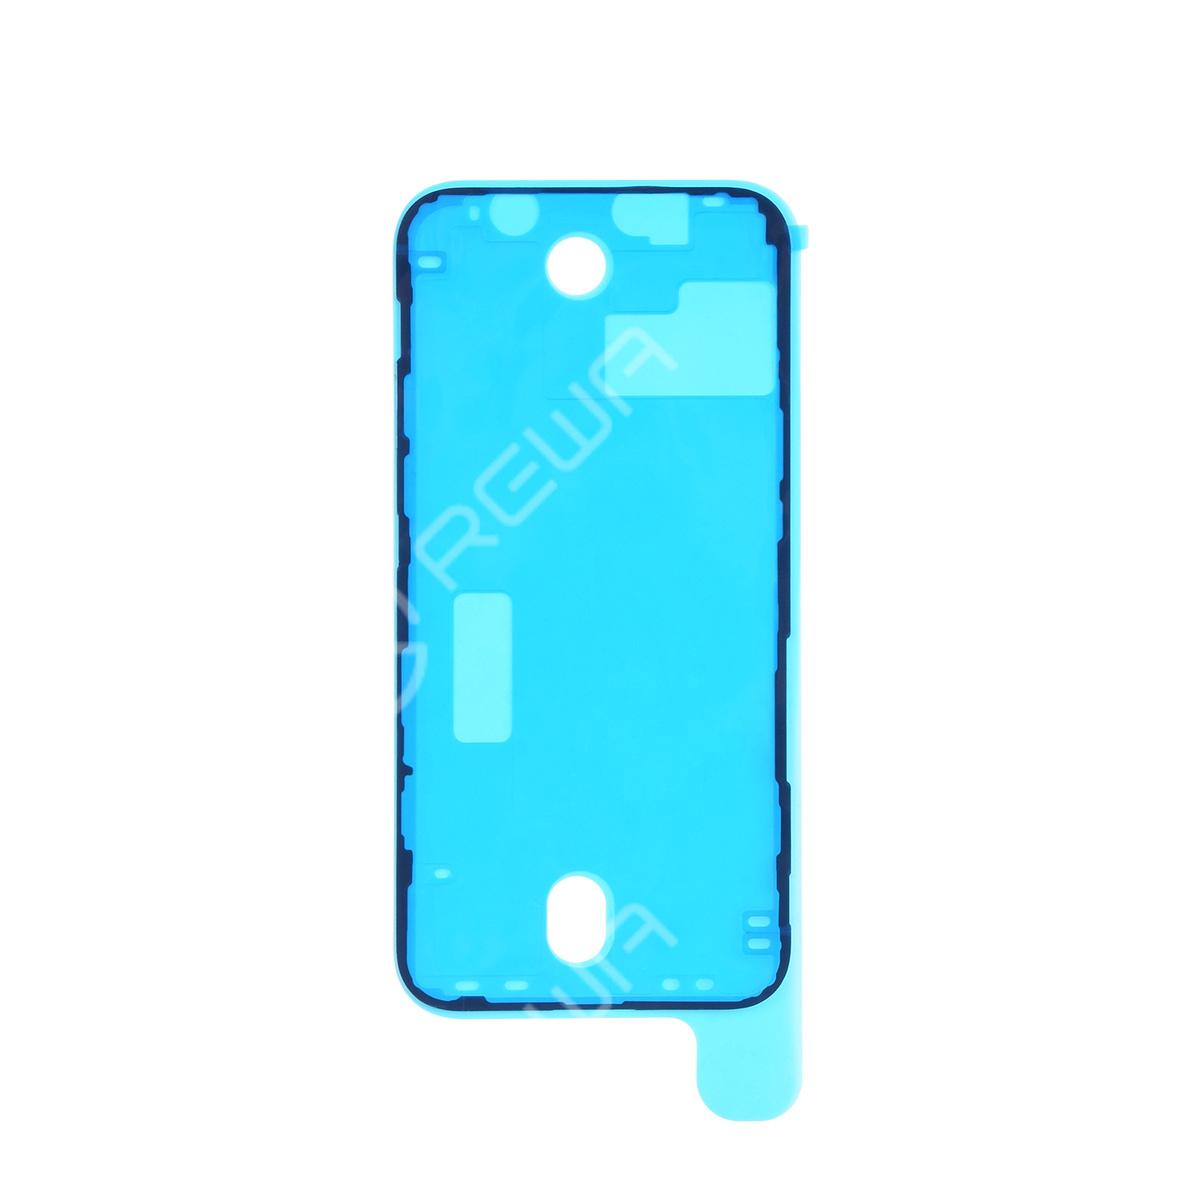 For Apple iPhone 12/12 Mini/12 PRO/12 PRO MAX Screen Repair Tape Waterproof Seal Sticker Replacement